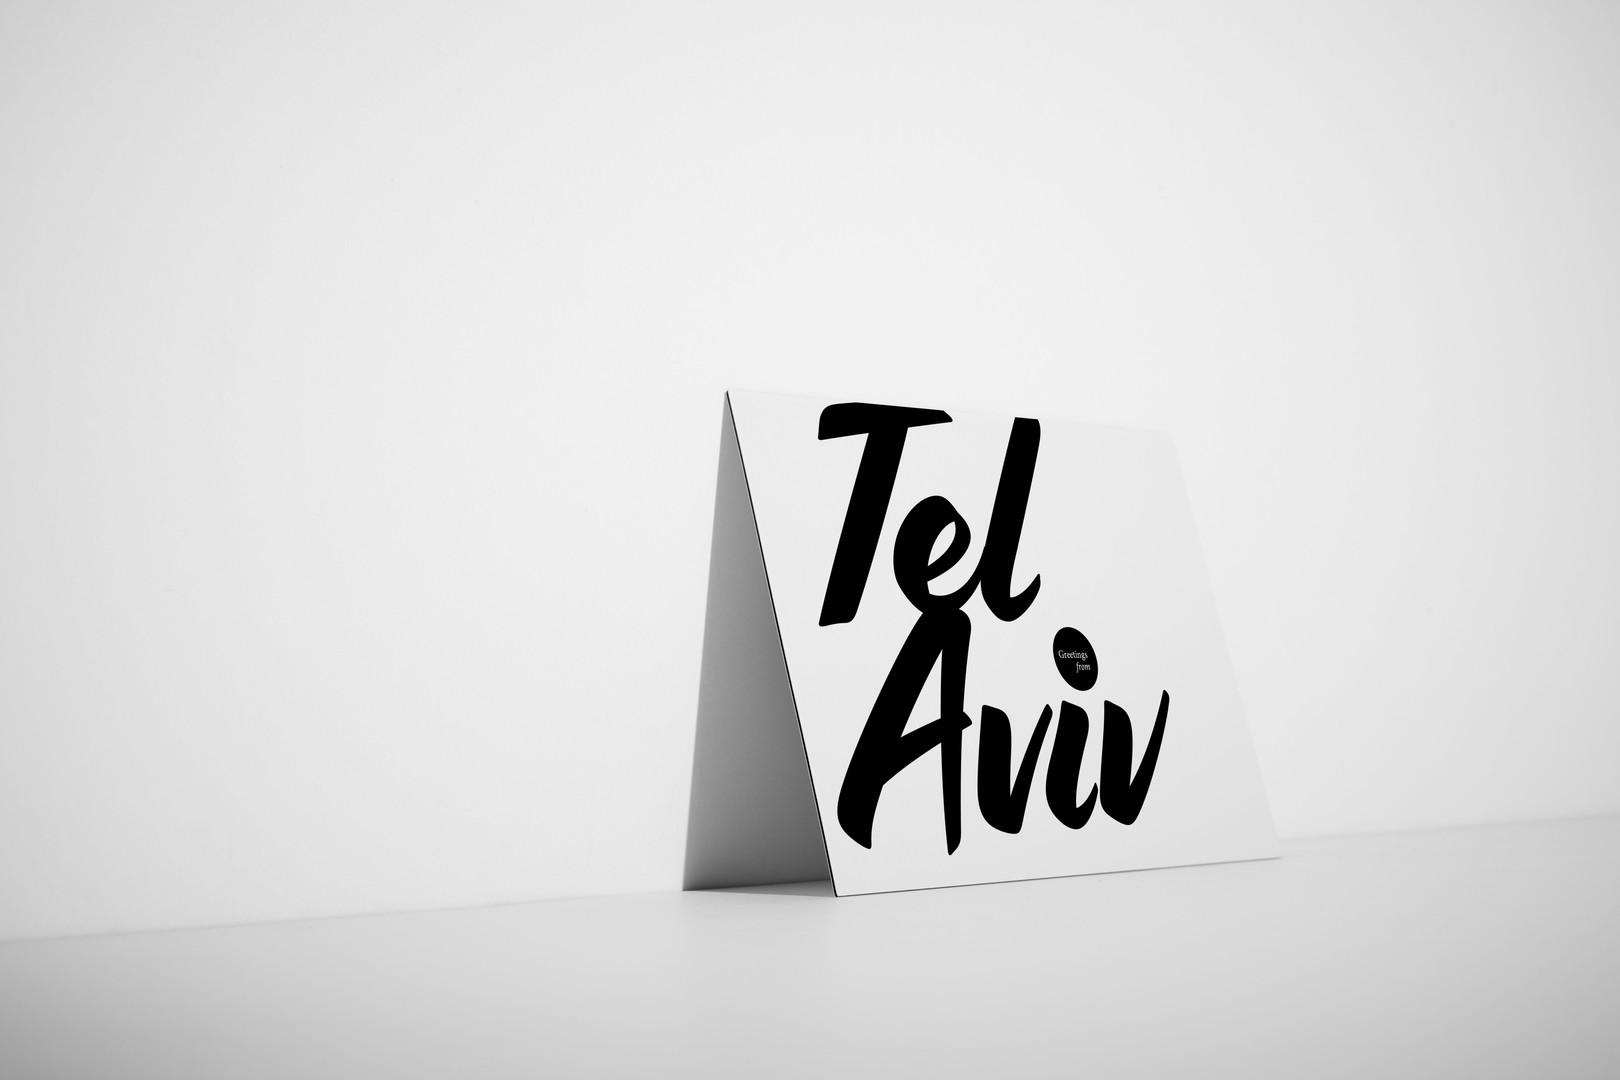 kleoncards_wall_tel_aviv.jpg